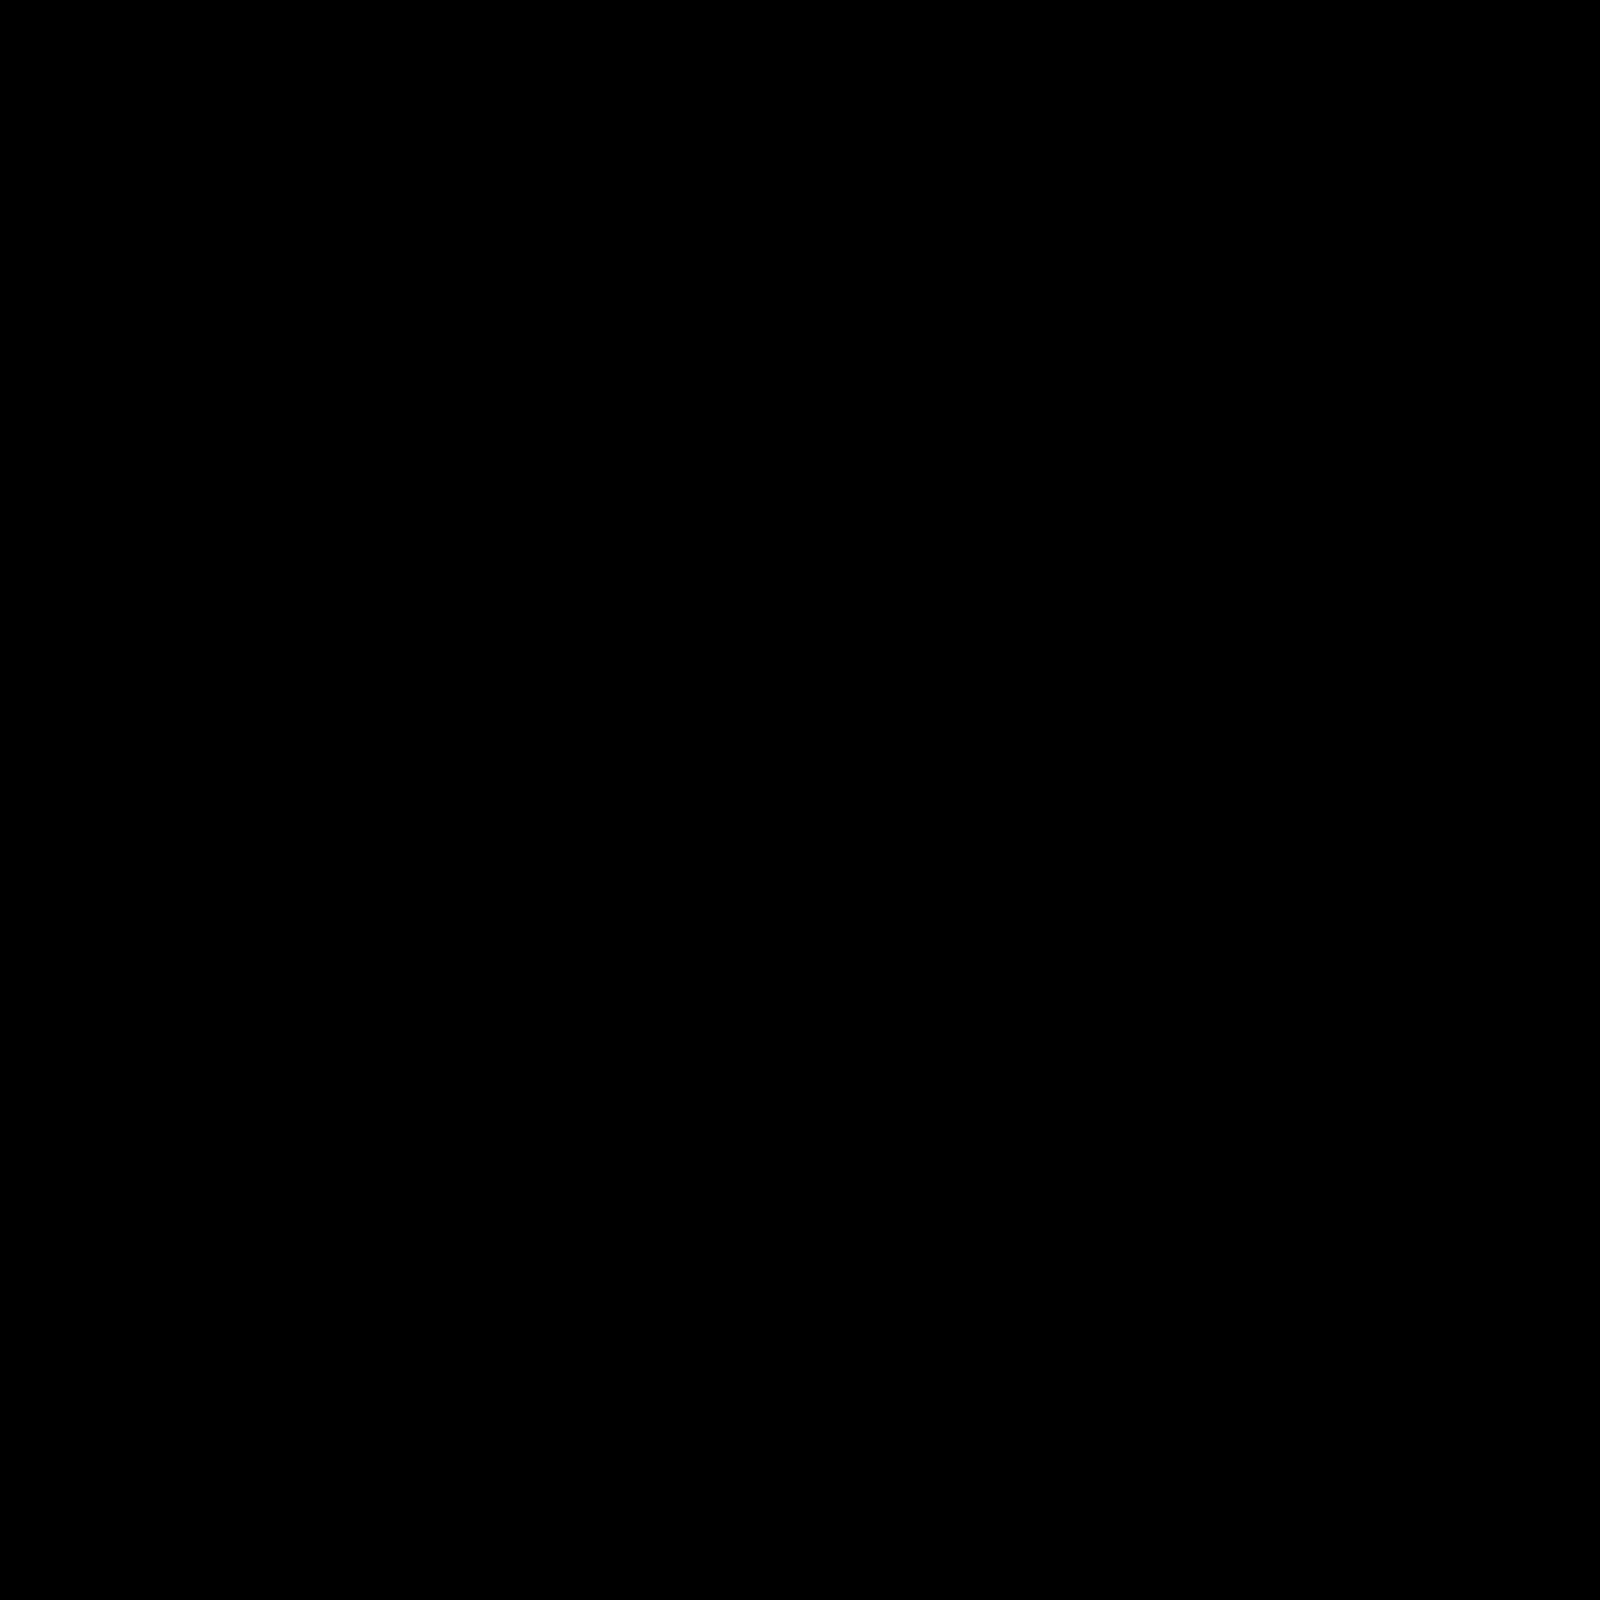 Download Free Vuitton Fashion Louis Gucci Logo Chanel Icon Favicon Freepngimg